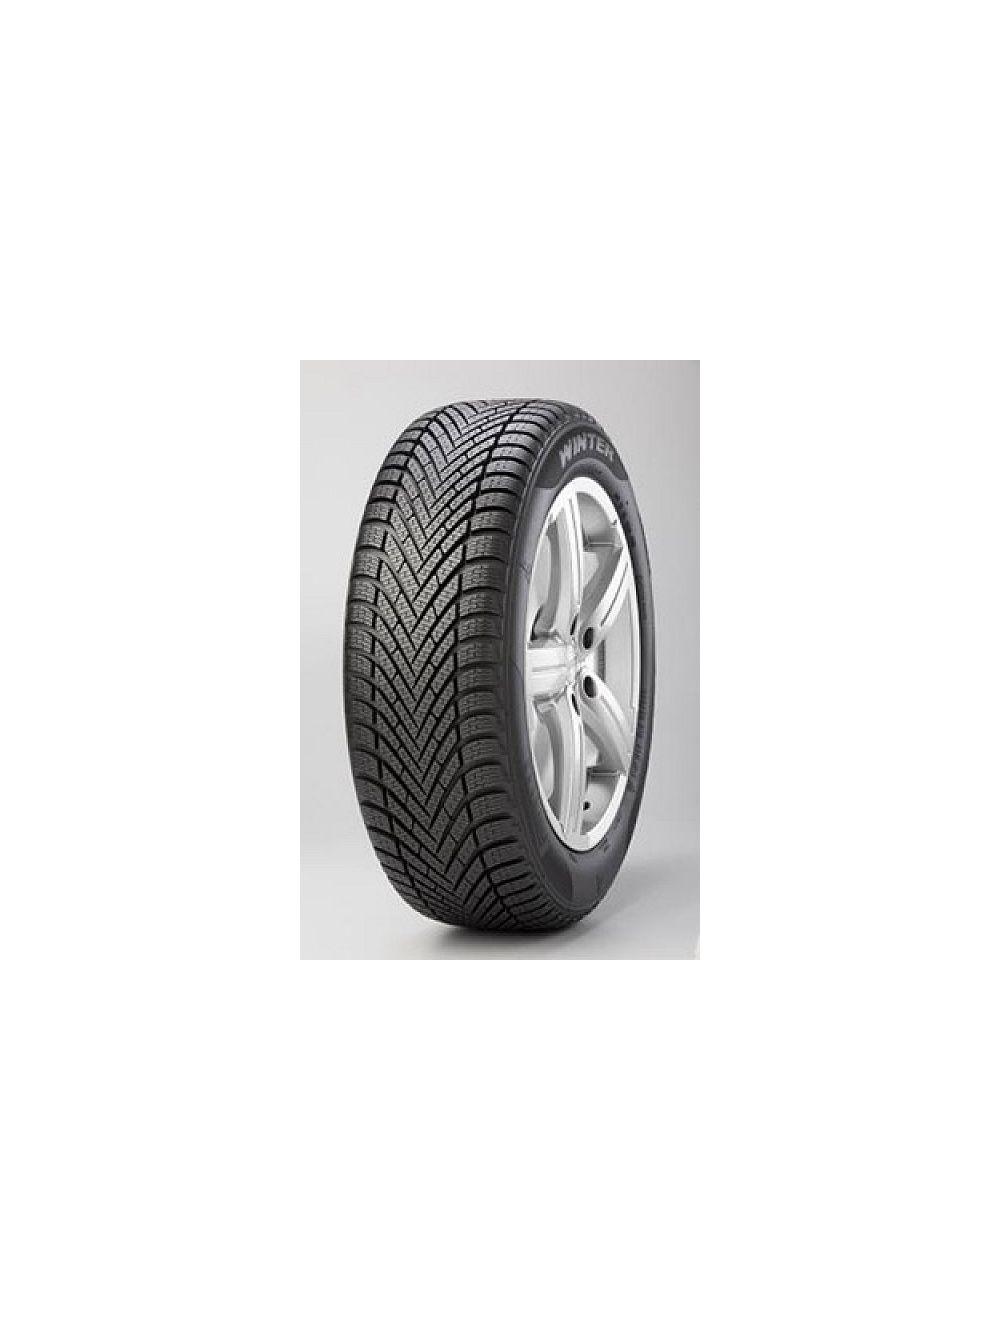 Pirelli 185/55R16 T Cinturato Winter XL Téli gumi